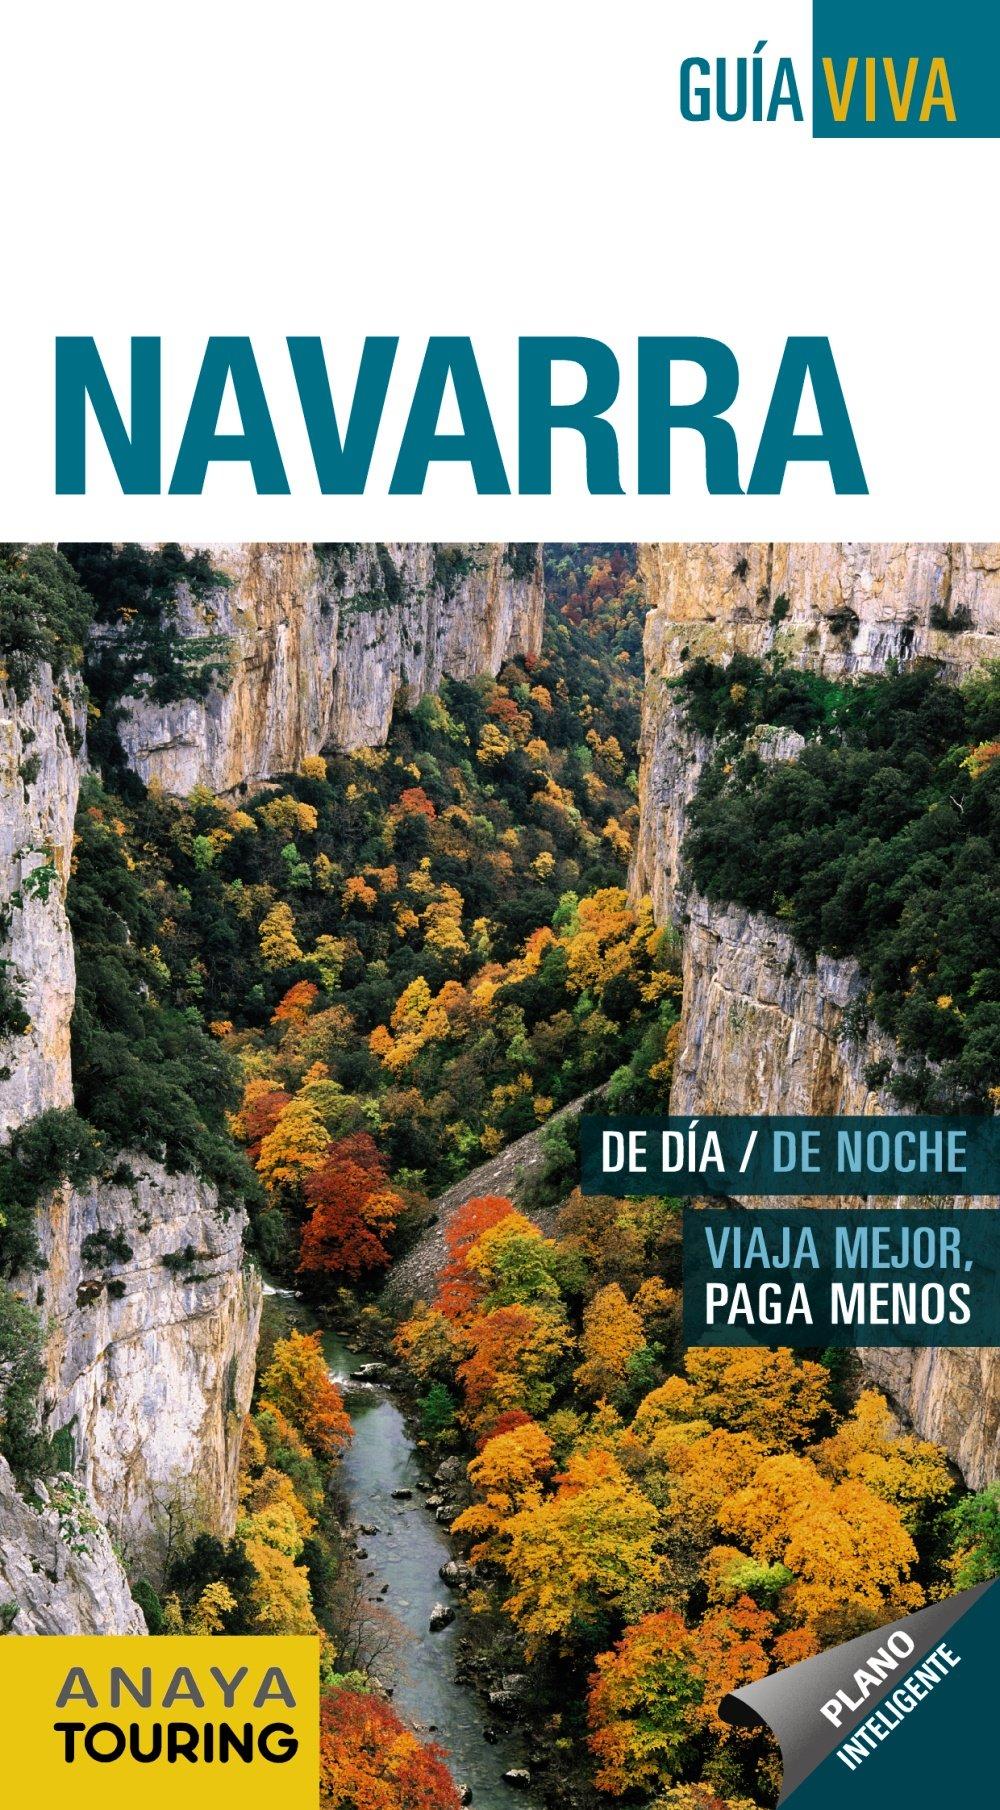 Navarra - Guía Viva (Guía Viva - España): Amazon.es: Hernández Colorado, Arantxa, Gómez, Iñaki, Sahats, Legarra Carrera, Javier: Libros